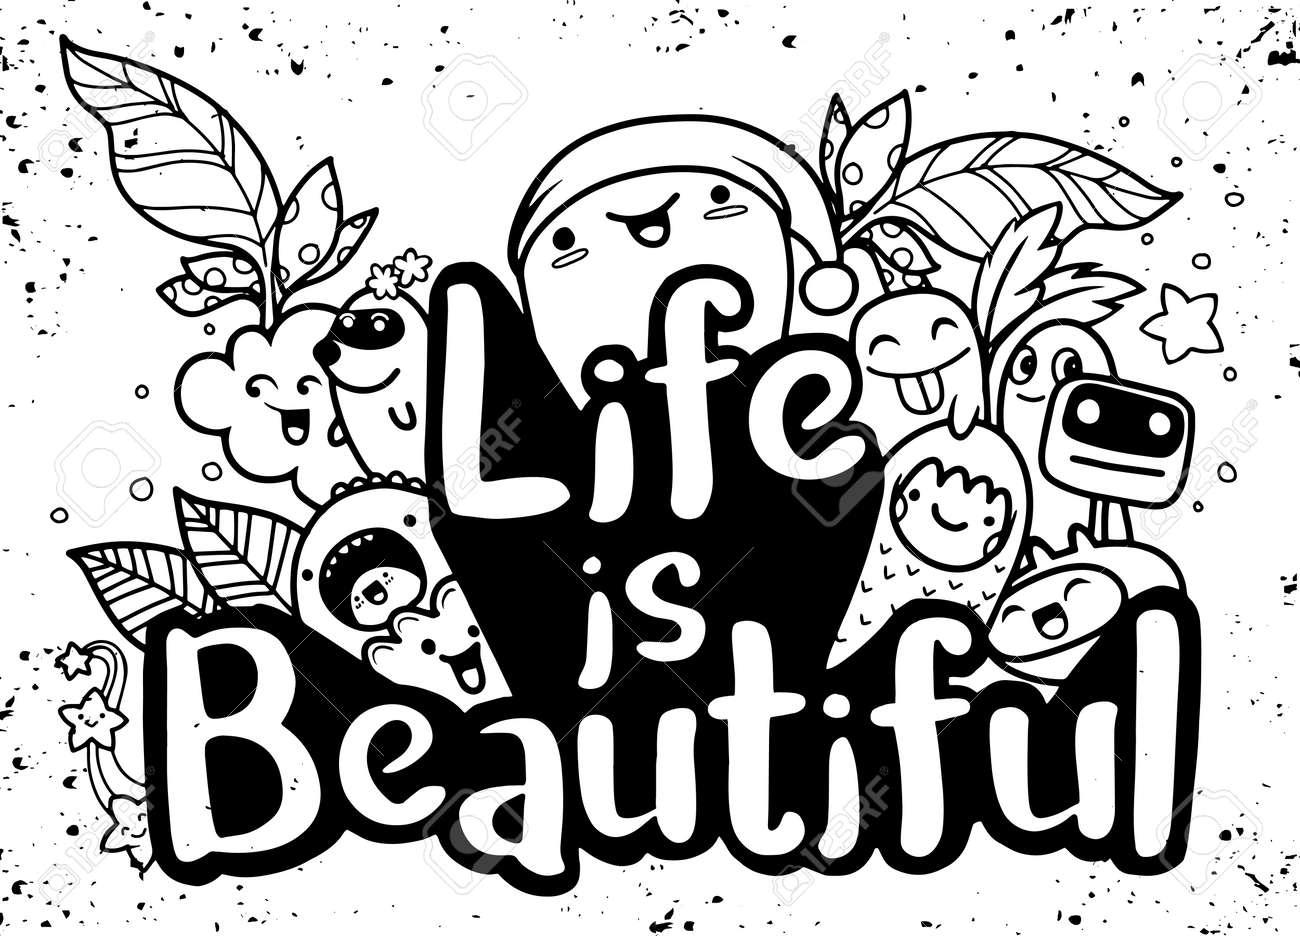 La Vita è Bella Serie Di Poster E Citazioni Di Mostri Di Mostri Opere D Arte Da Indossare Illustrazione Vettoriale Di Ispirazione